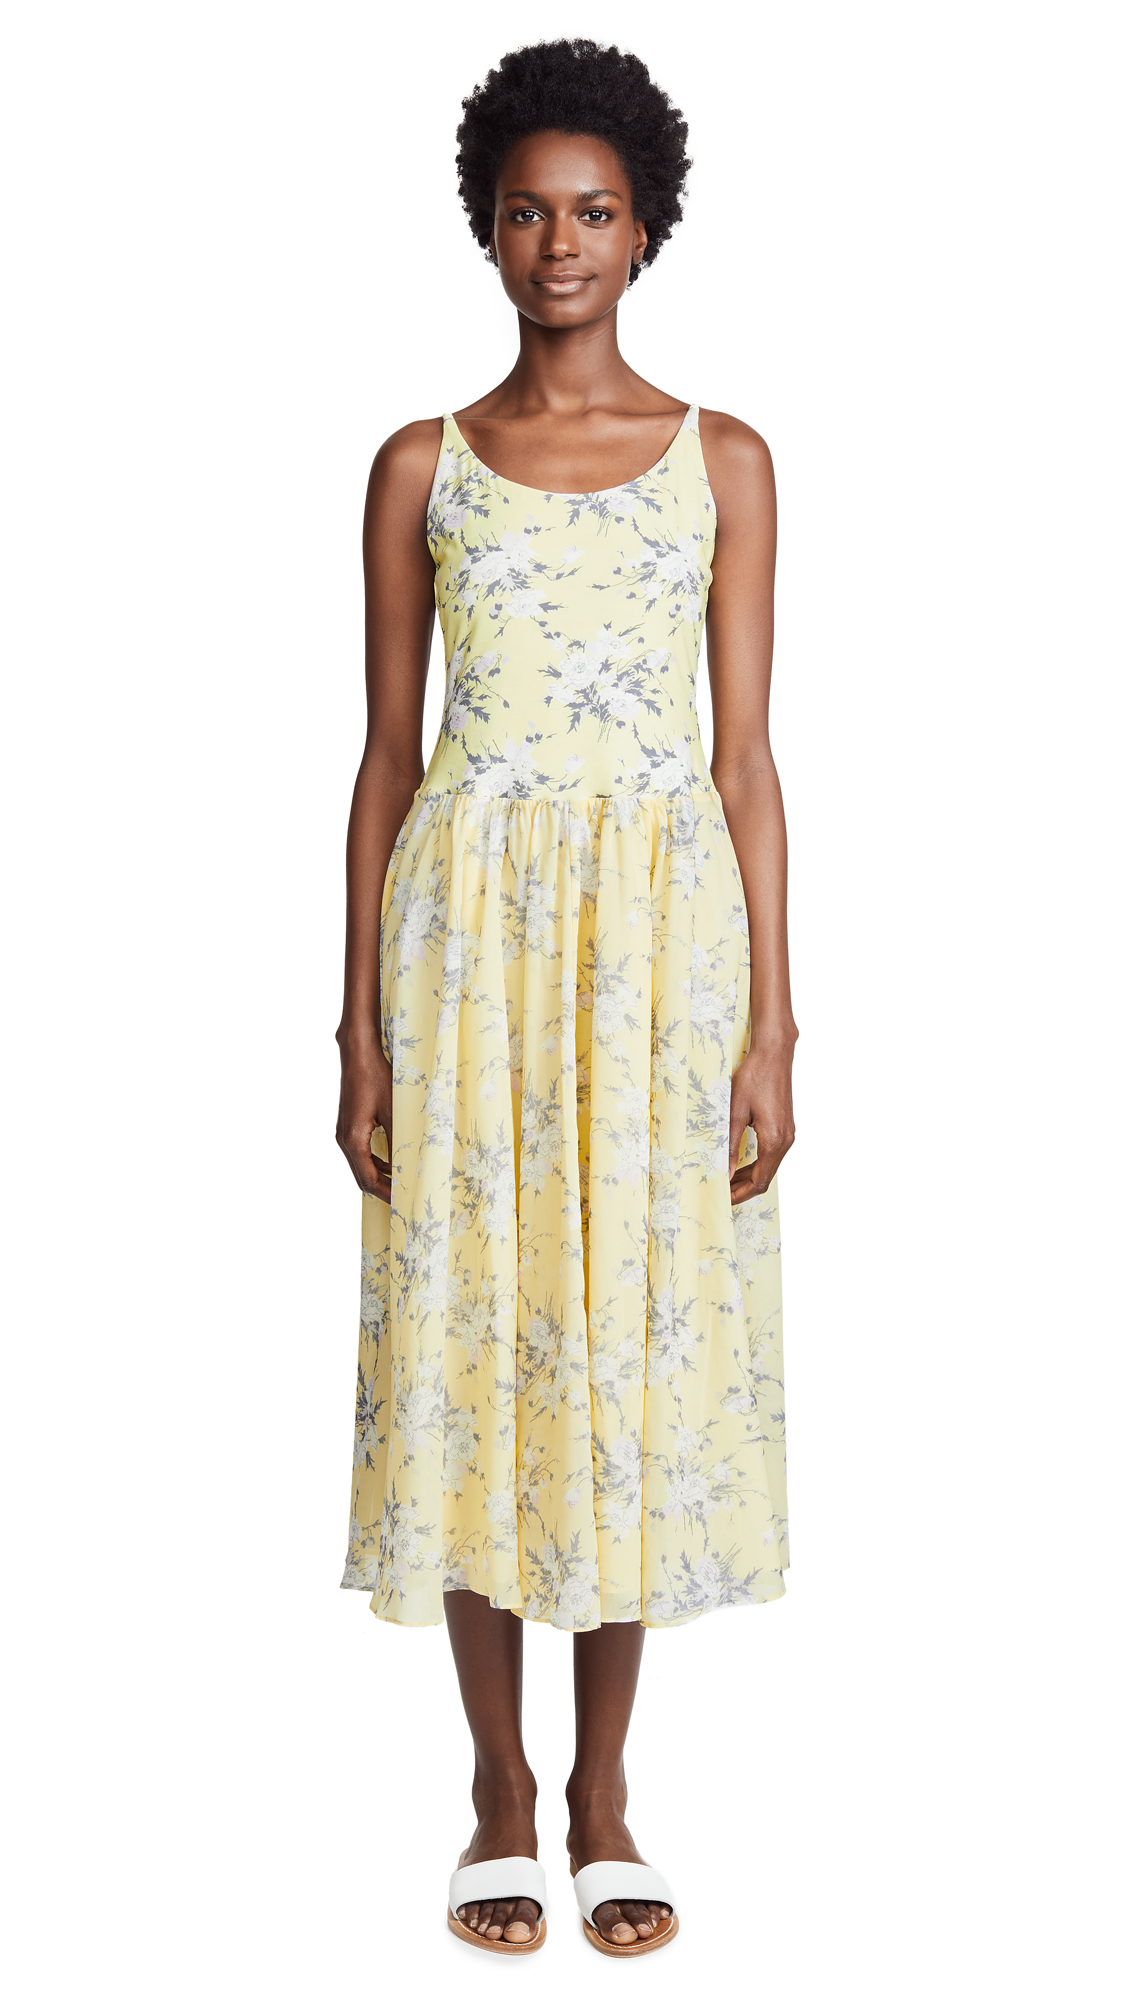 Rebecca Taylor Lemon Jersey Dress In Lemon Combo